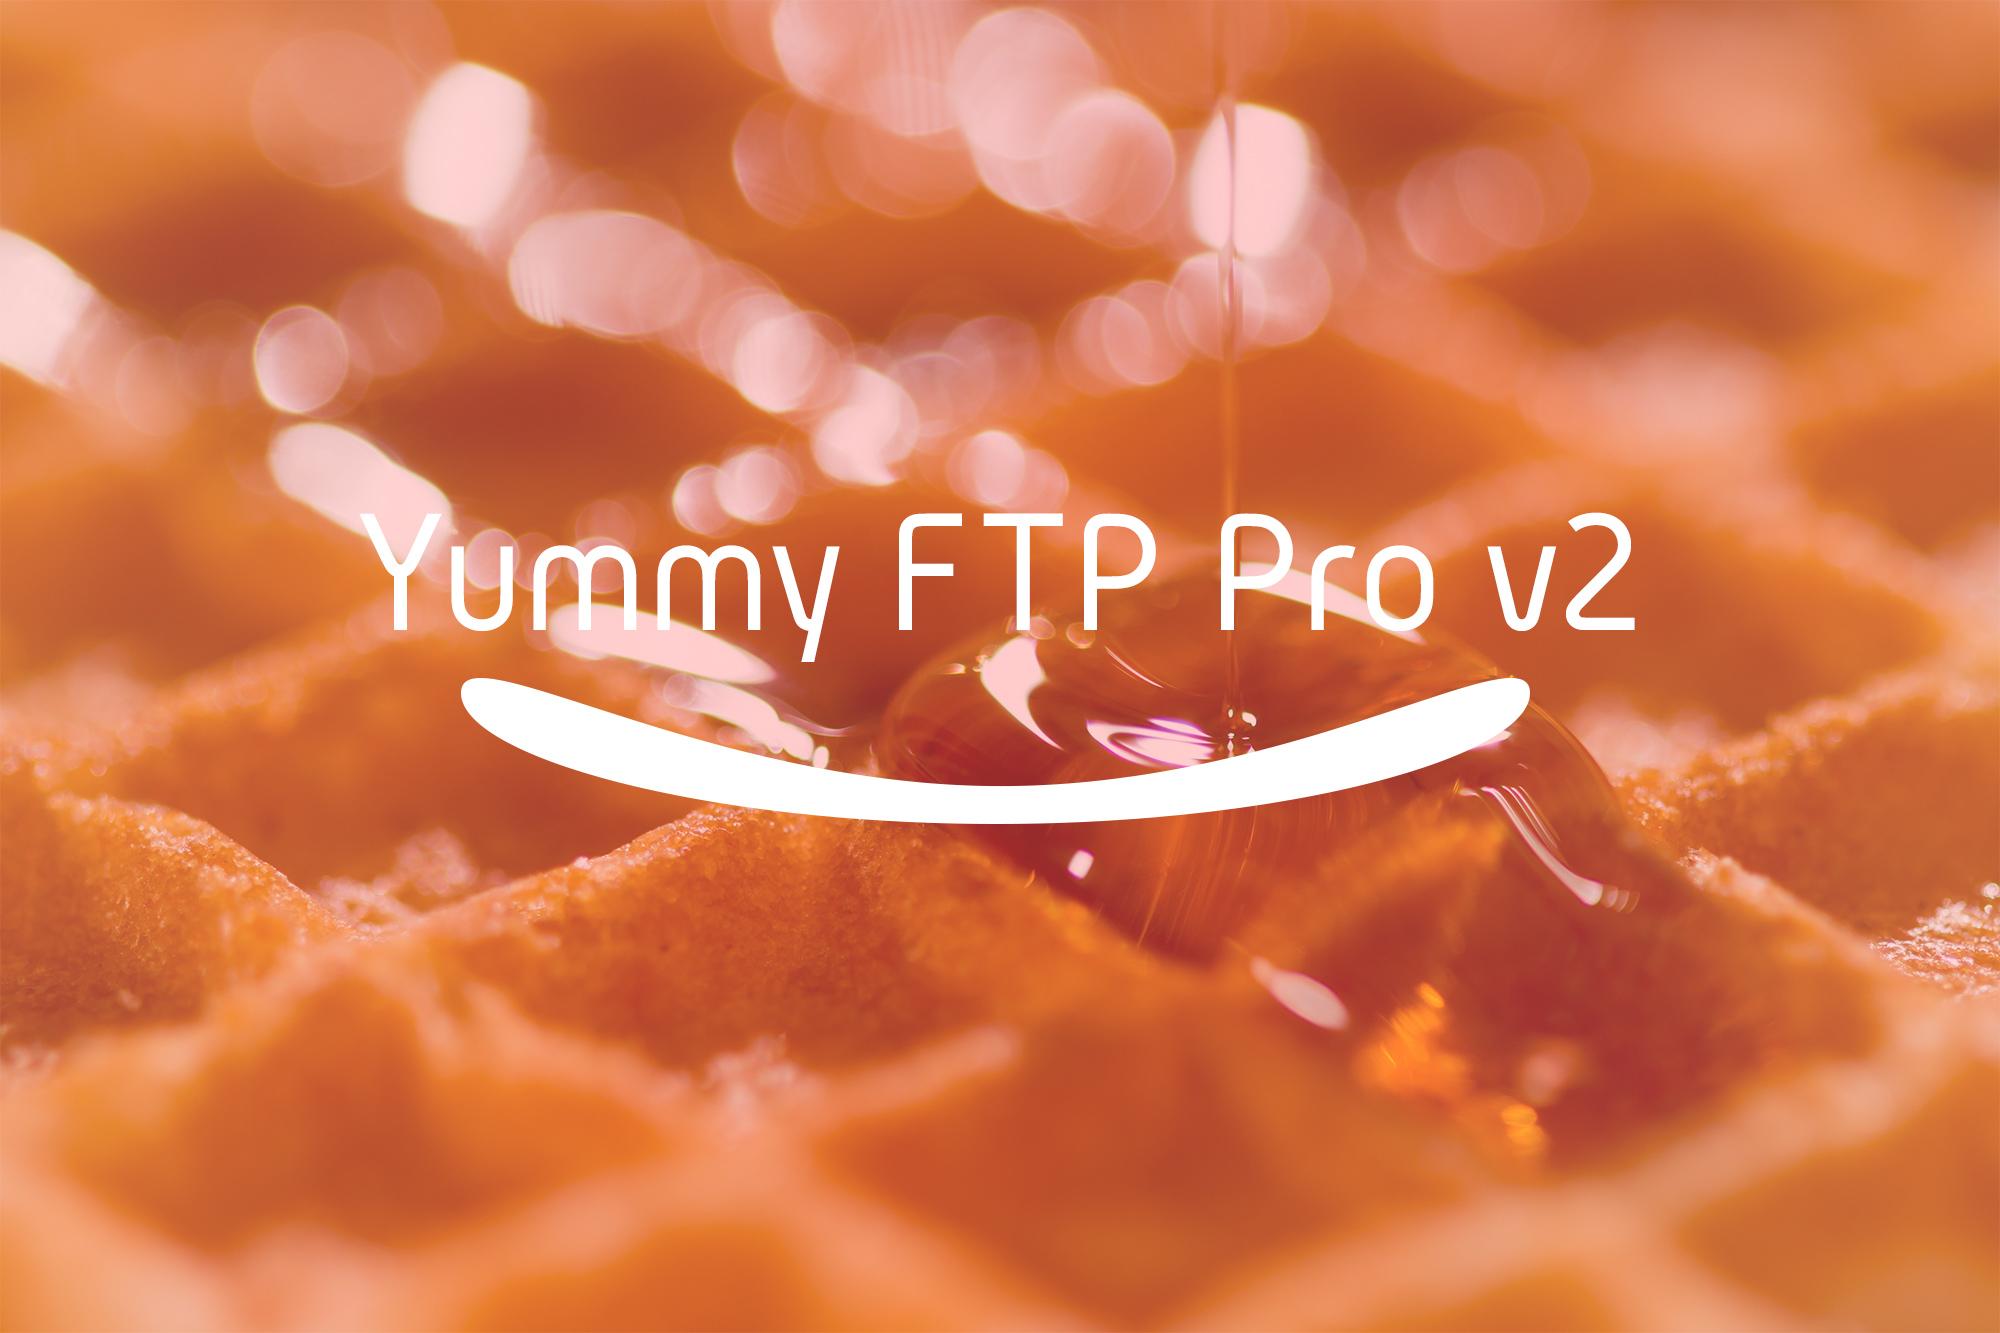 yummy ftp pro v2が出てた